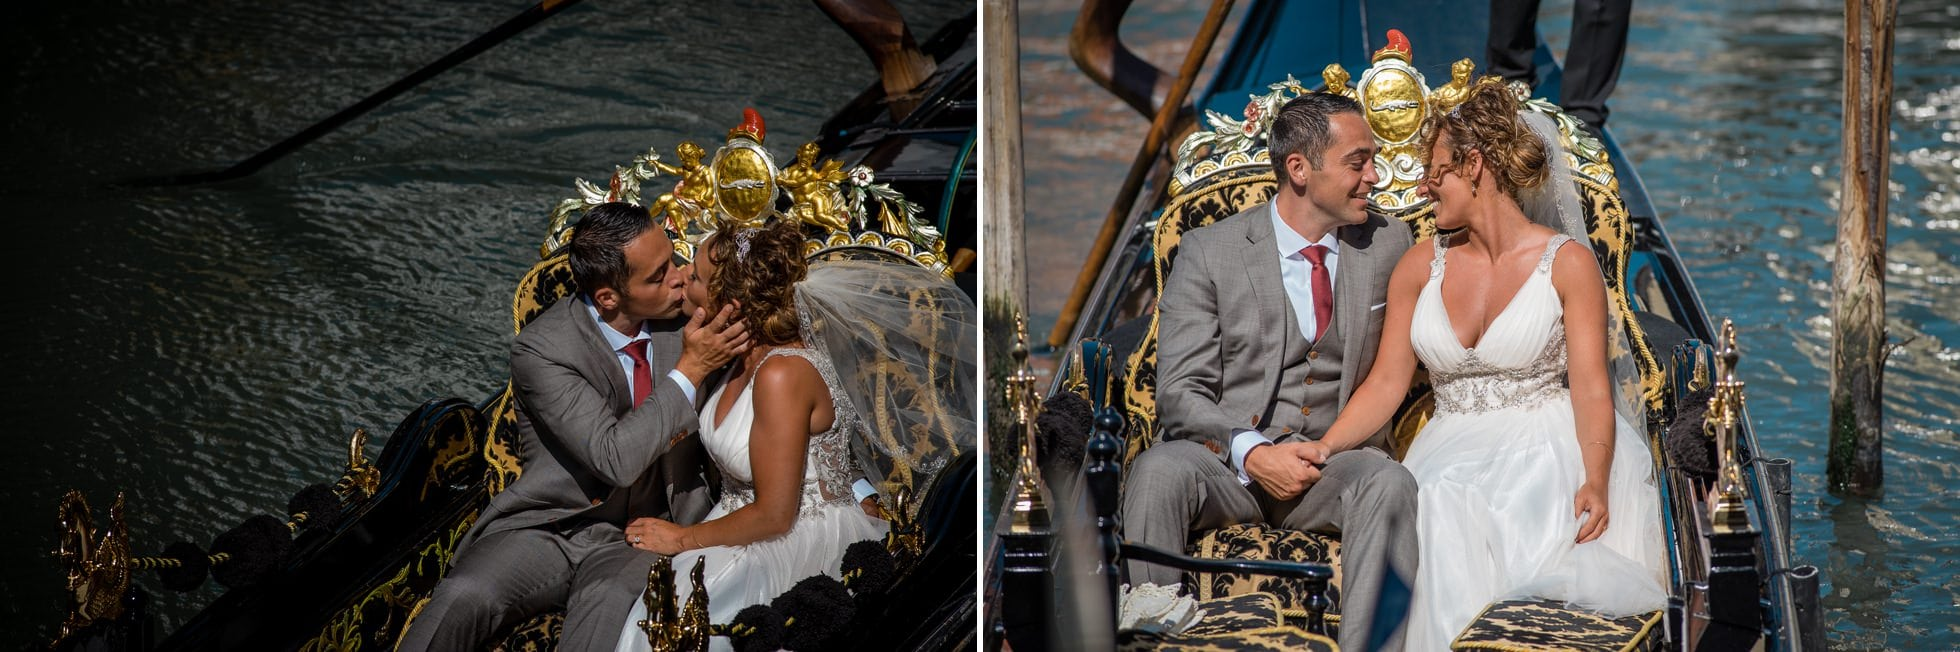 Fotografo matrimonio gondola